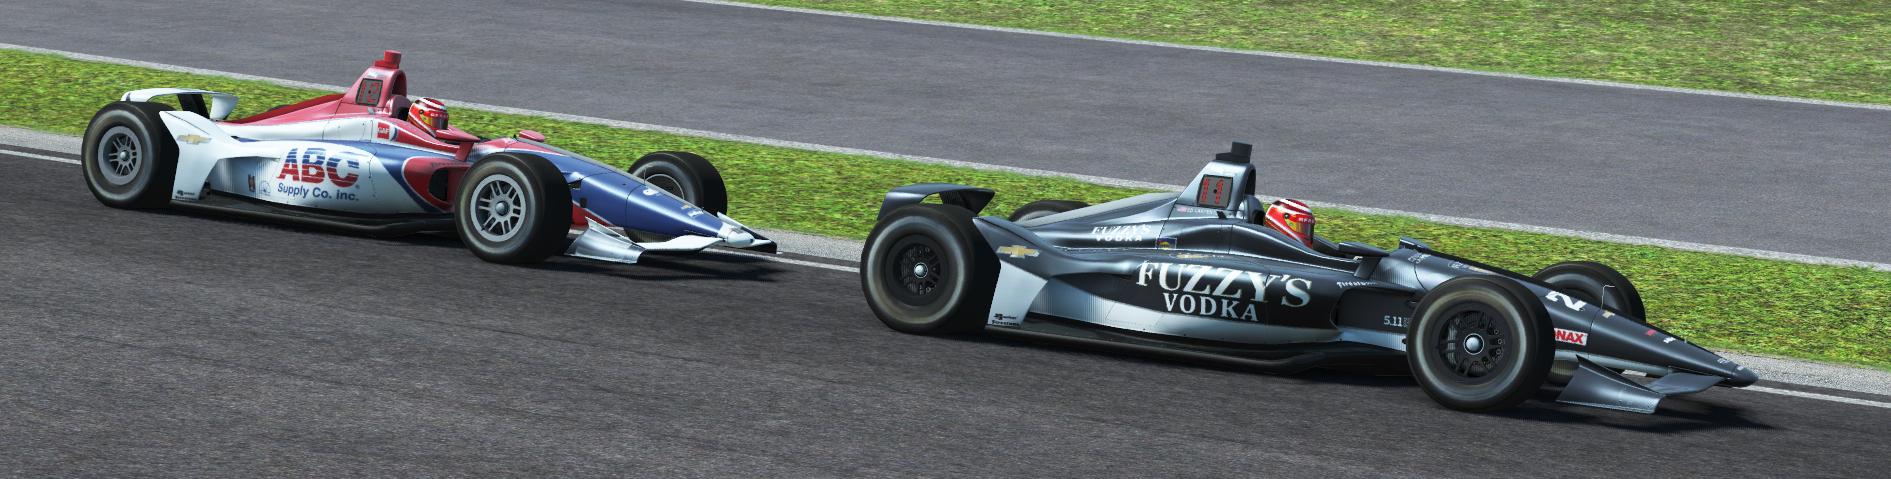 Indycar 2018 v1 0 (unofficial)